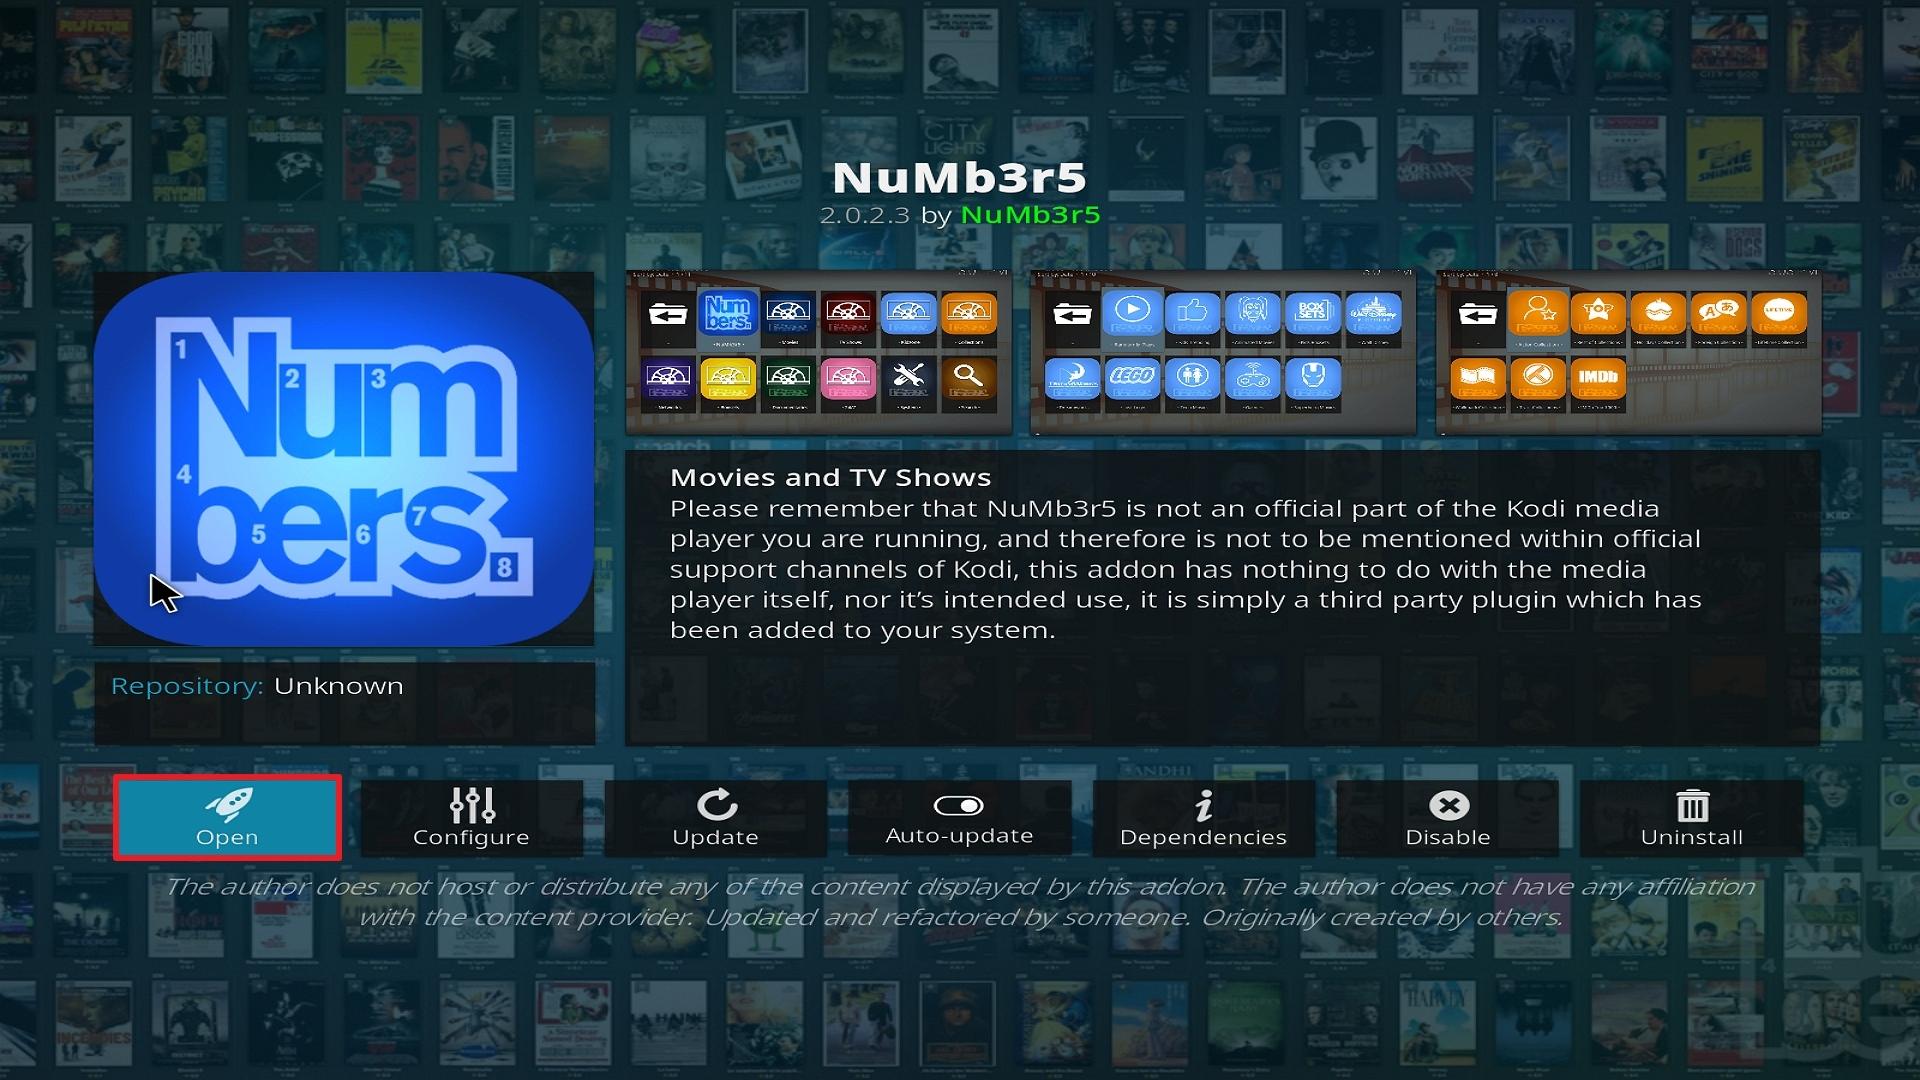 Step 26 Installing Numb3r5 on Kodi